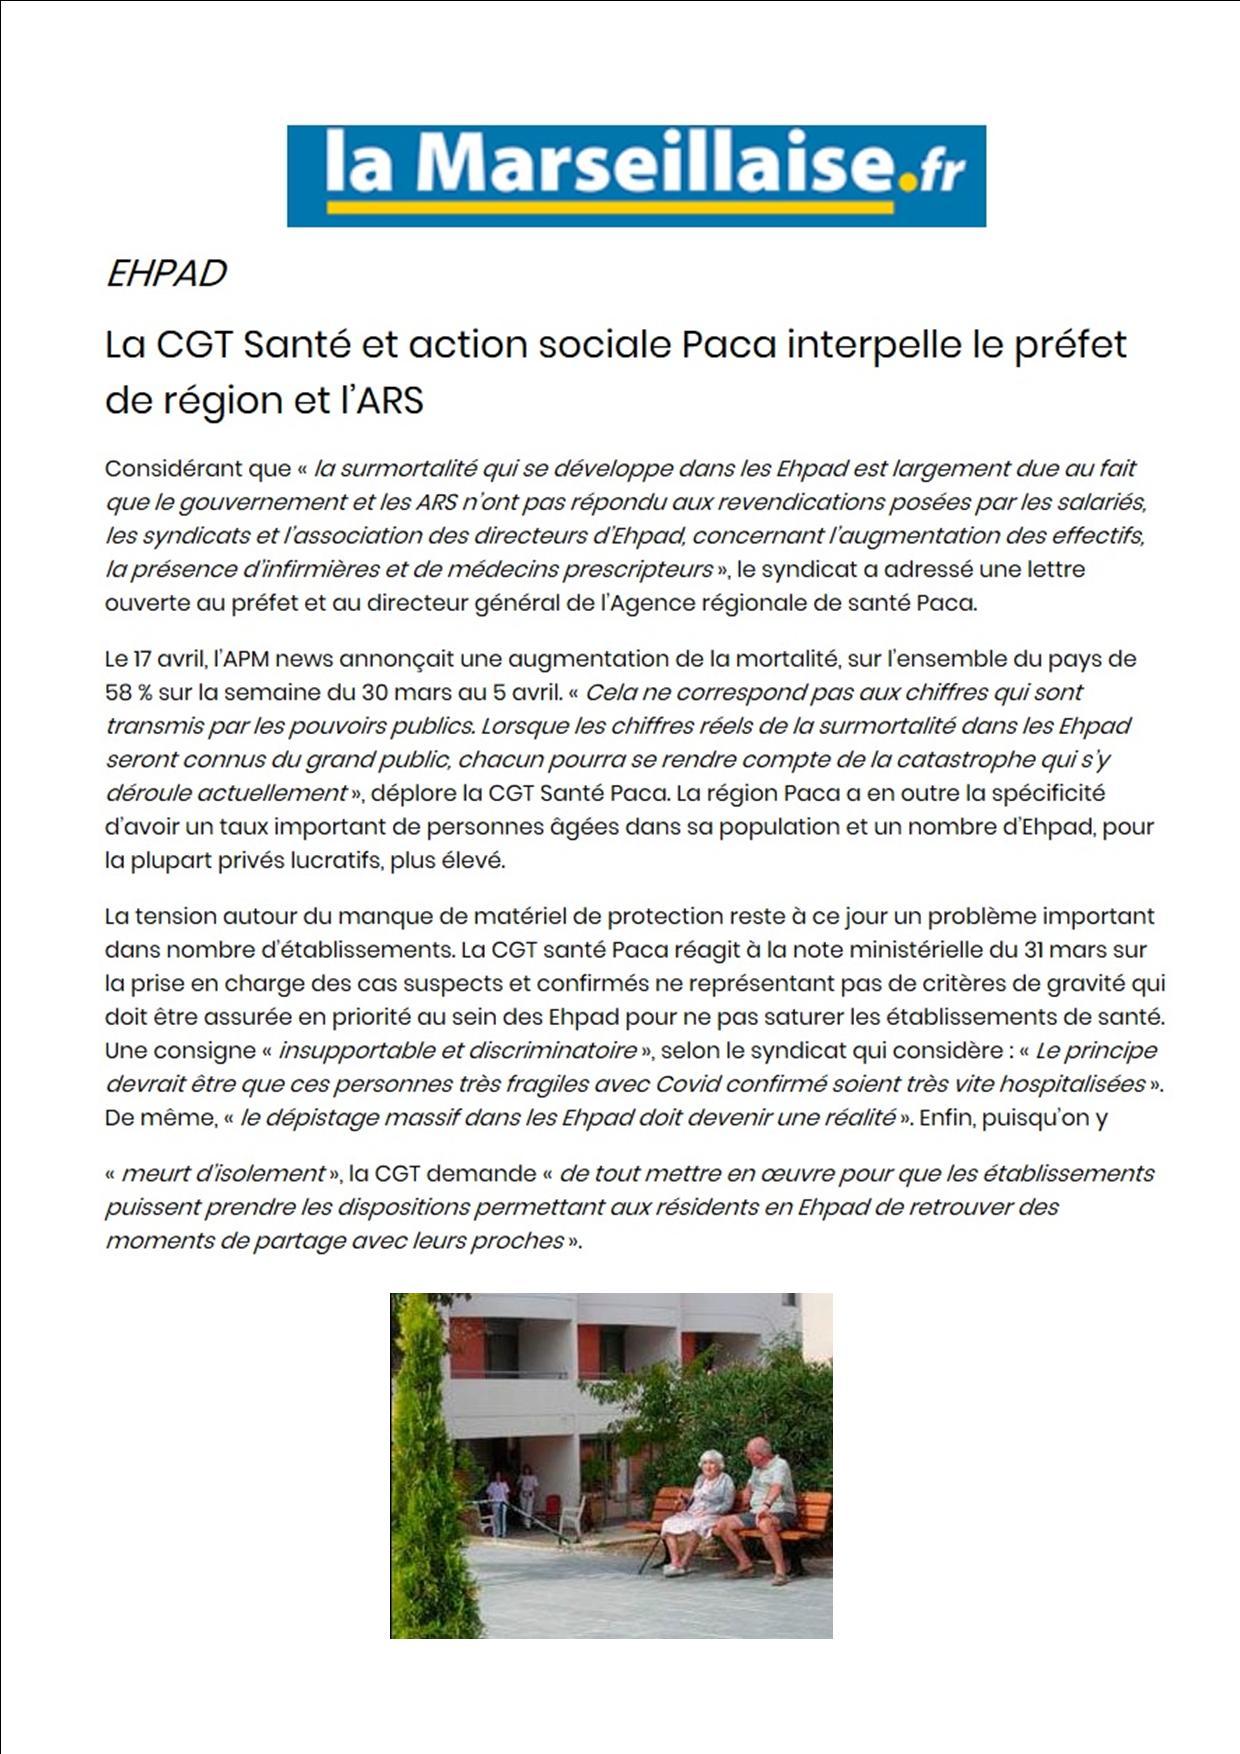 Article EHPAD CGT PACA La Marseillaise le 25 avril 2020